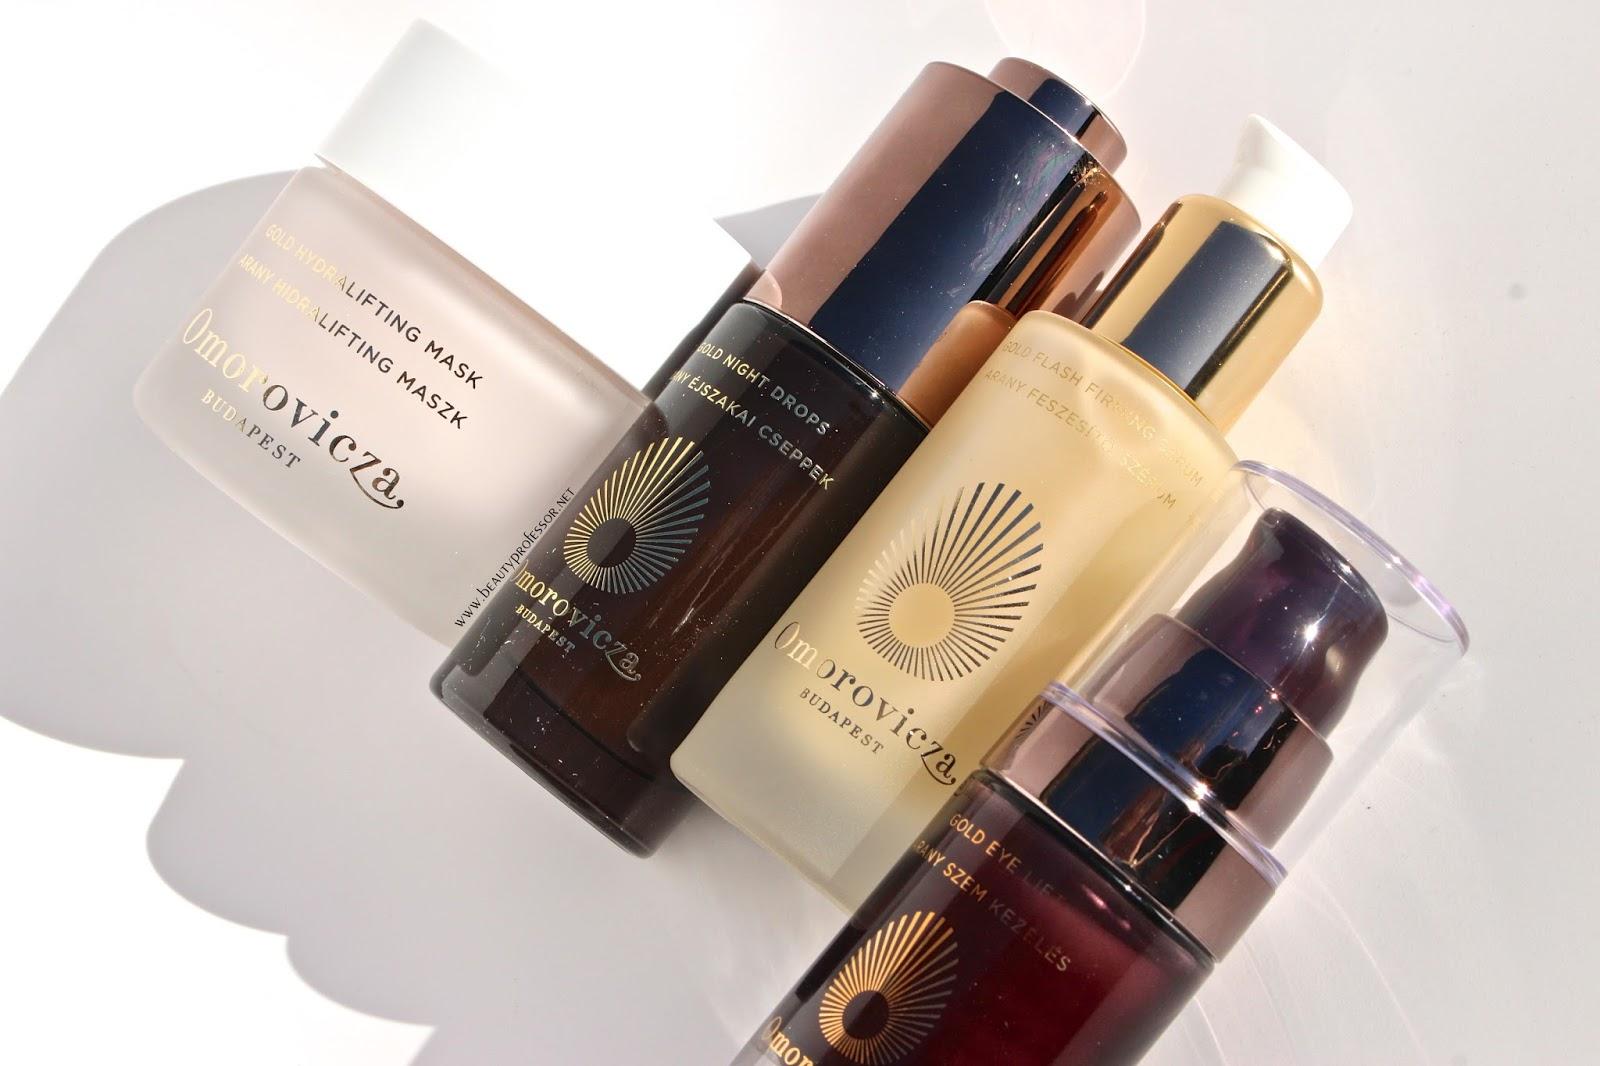 Last look.  sc 1 st  Beauty Professor & Beauty Professor: Skincare Spotlight: Omorovicza Gold Collection + ... azcodes.com